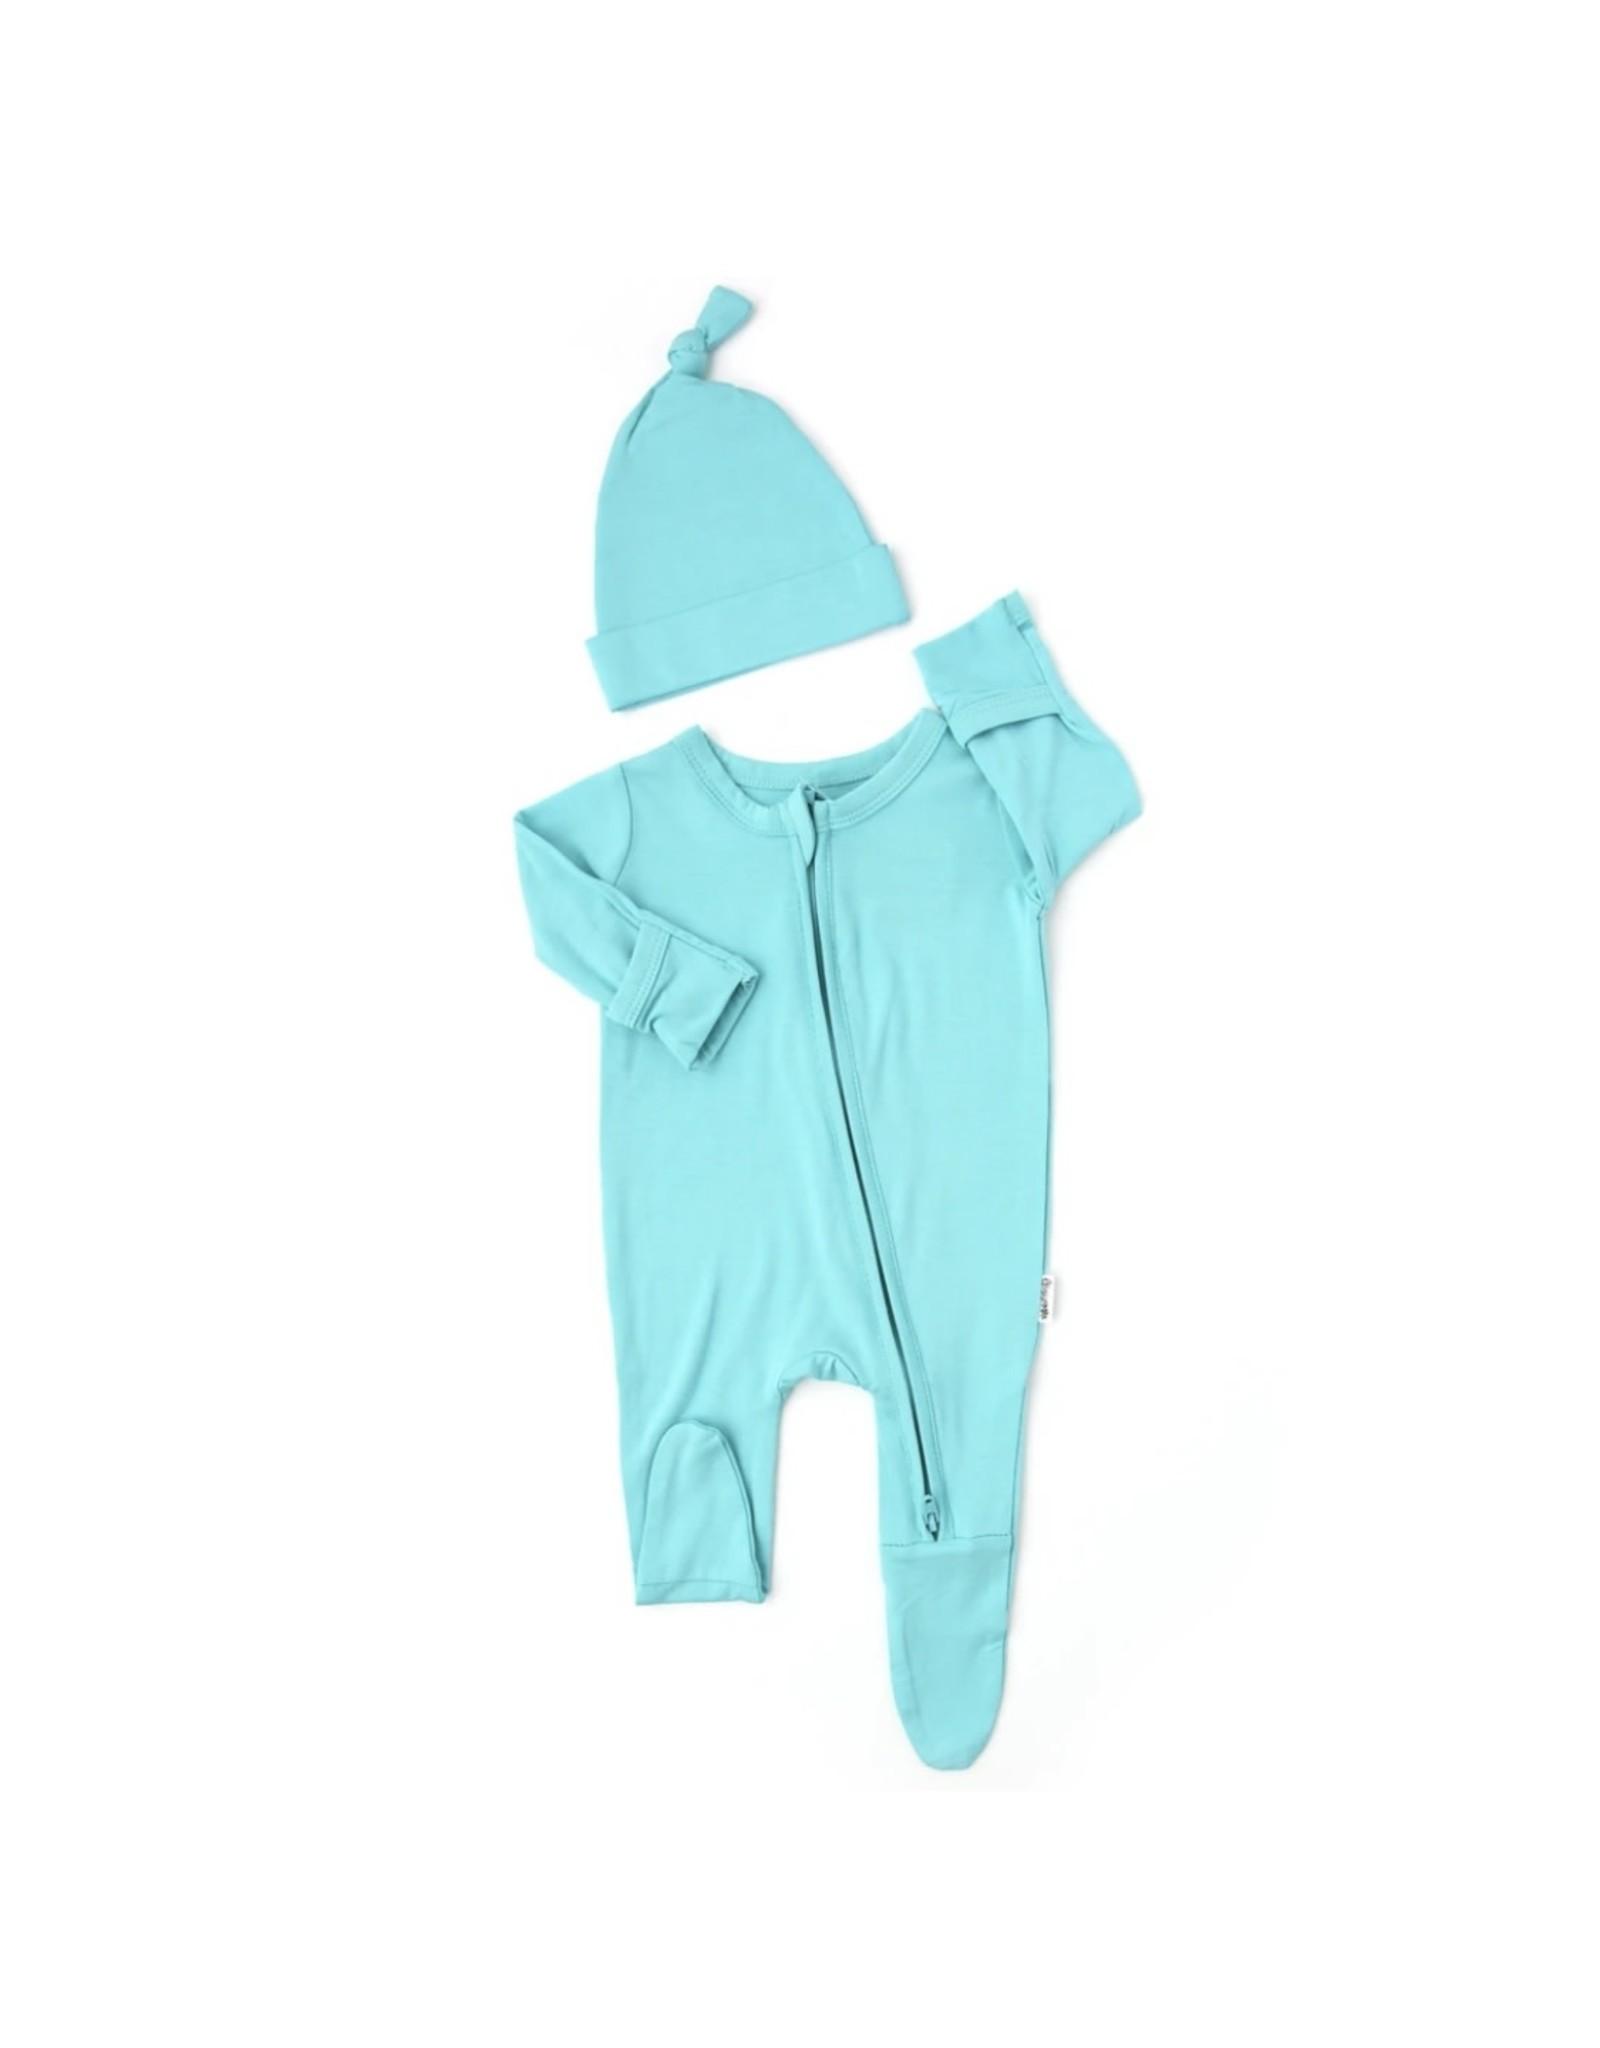 Gigi & Max Gigi & Max- Reese Blue NB Zipper Footie & Hat Set